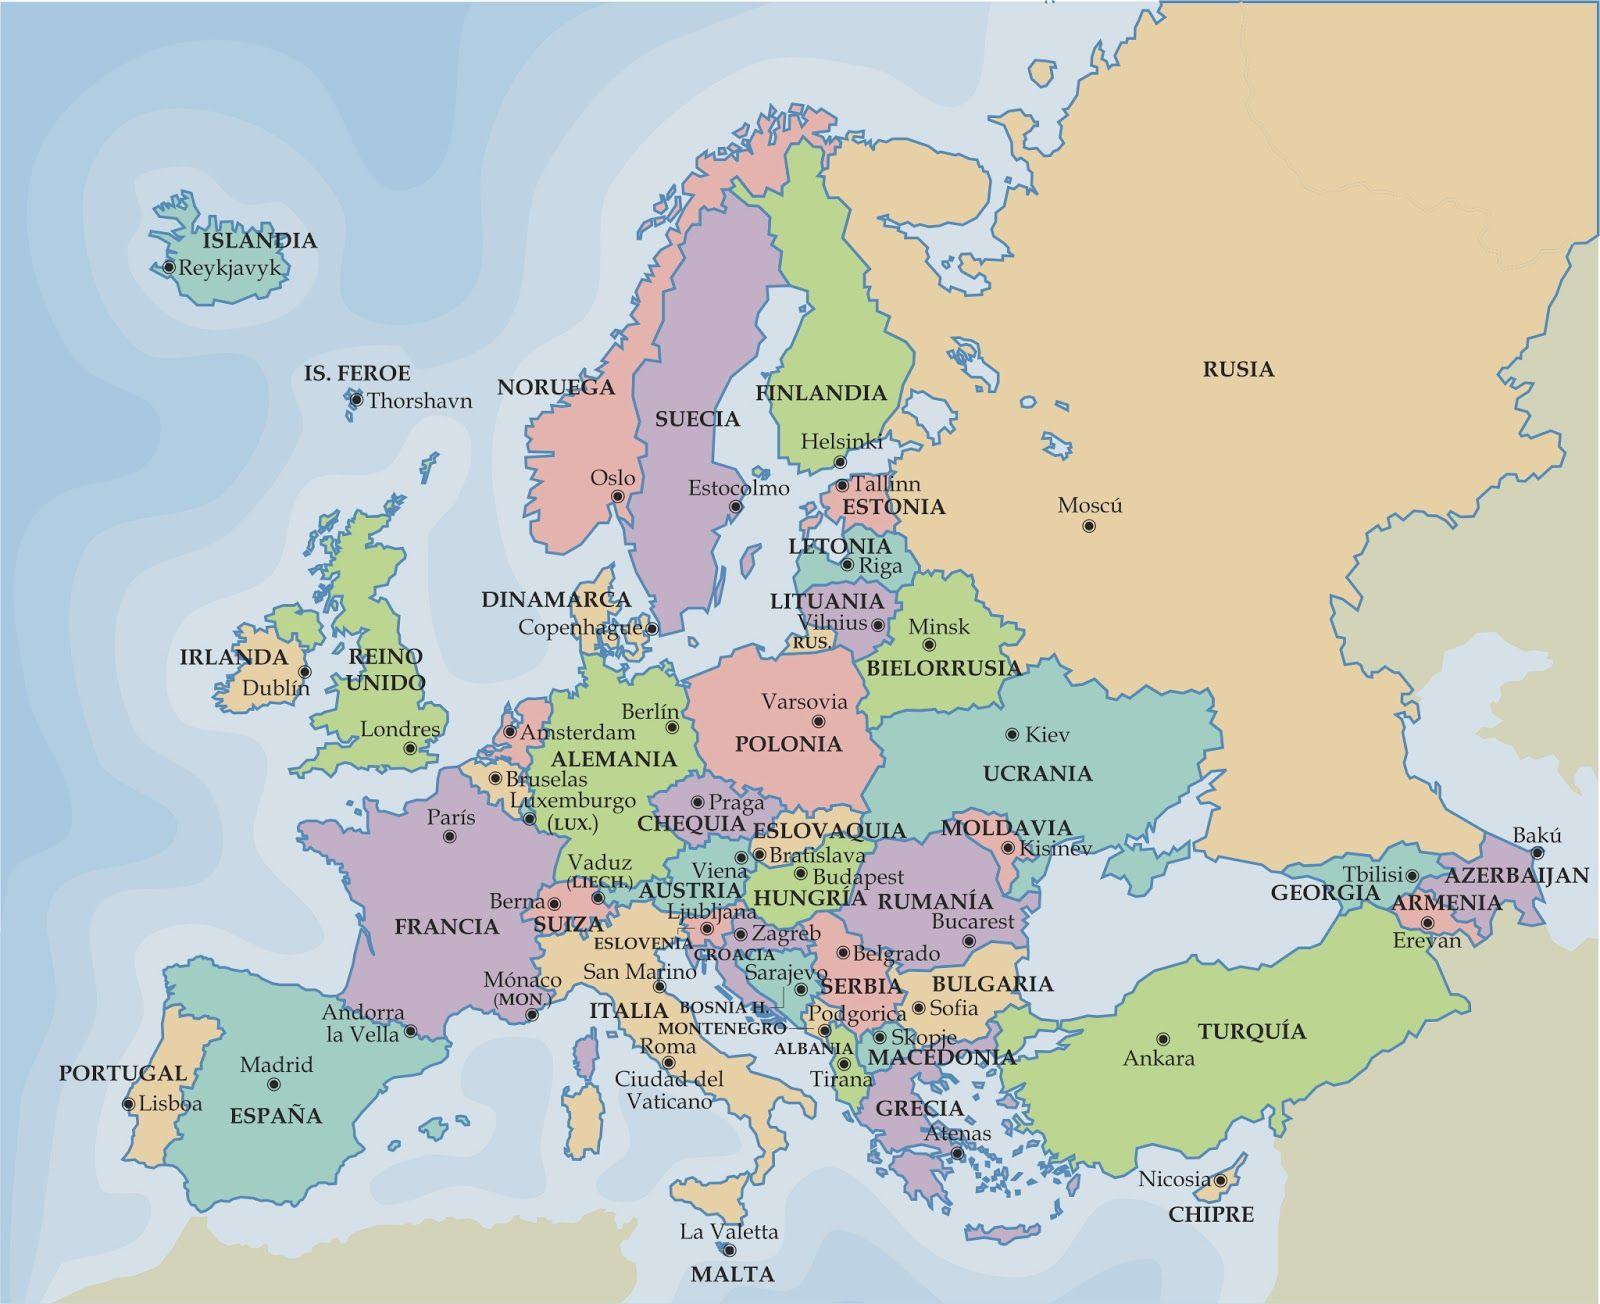 Mapa De Paises Europeos.Ciencias Sociales Mapa Politico De Europa Paises Y